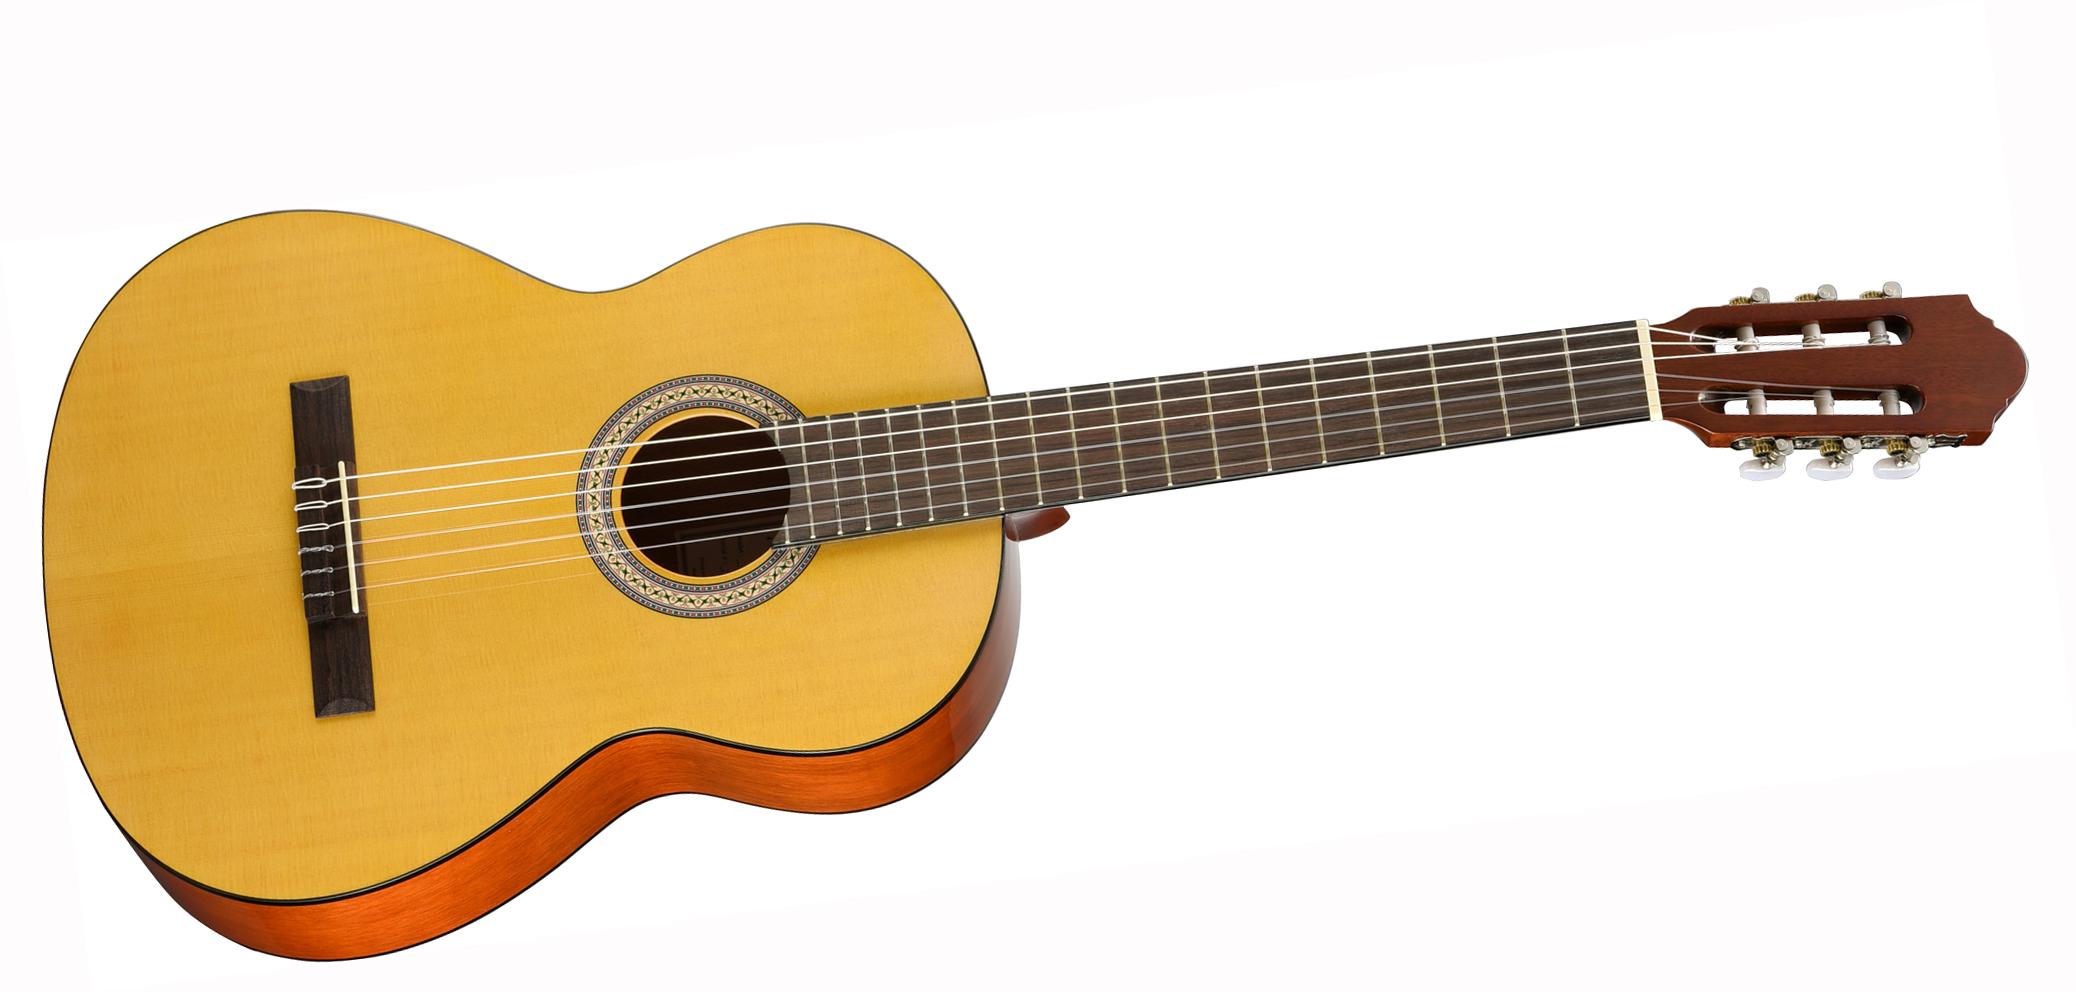 Walden N350-34W Classical Guitar, 3/4 sized